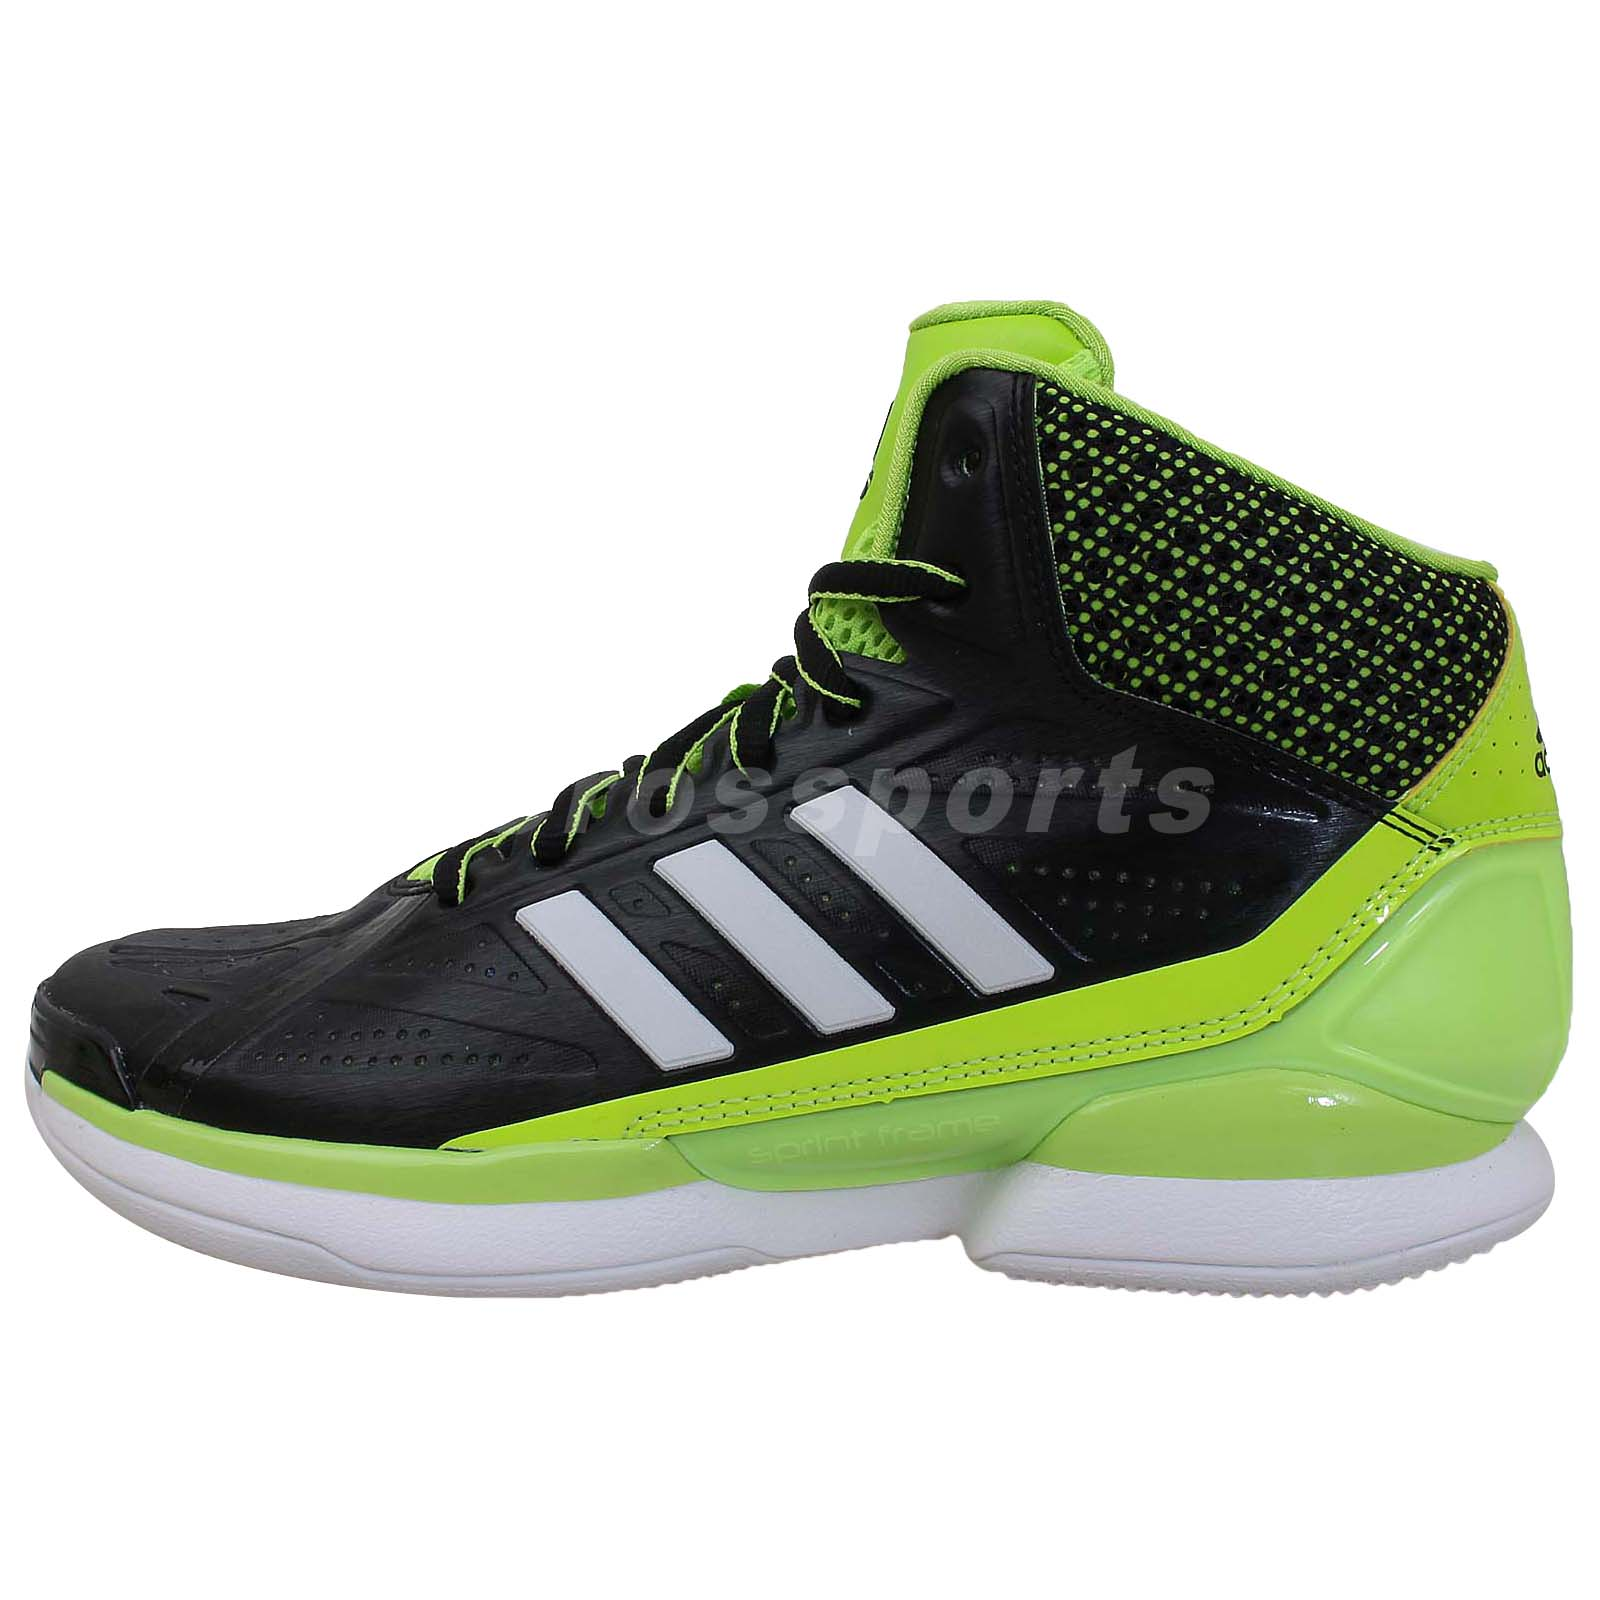 adidas basketball shoes green